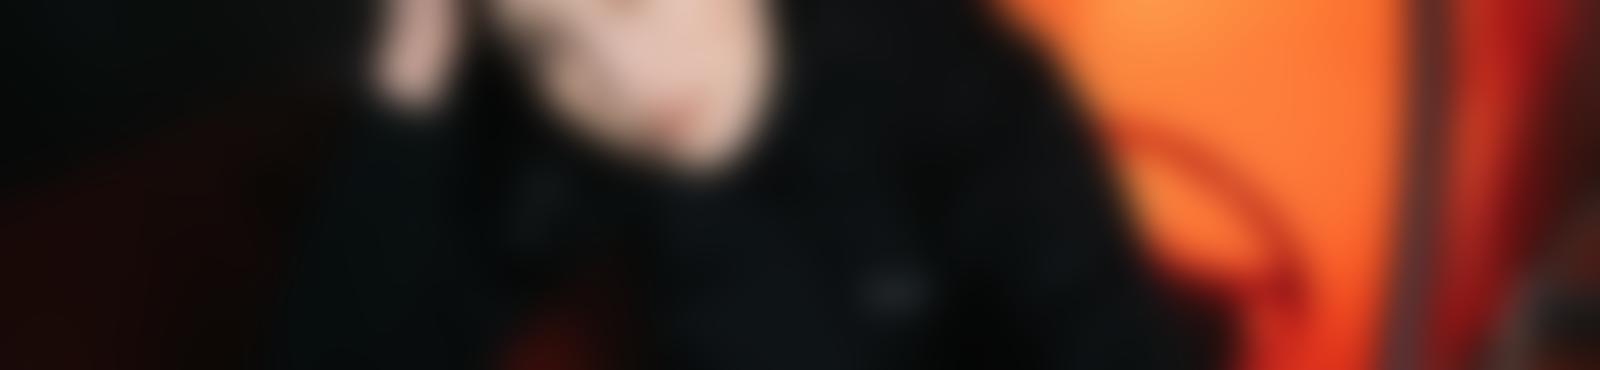 Blurred ffee0fd4 8e6d 4221 a53b 80a240eac998